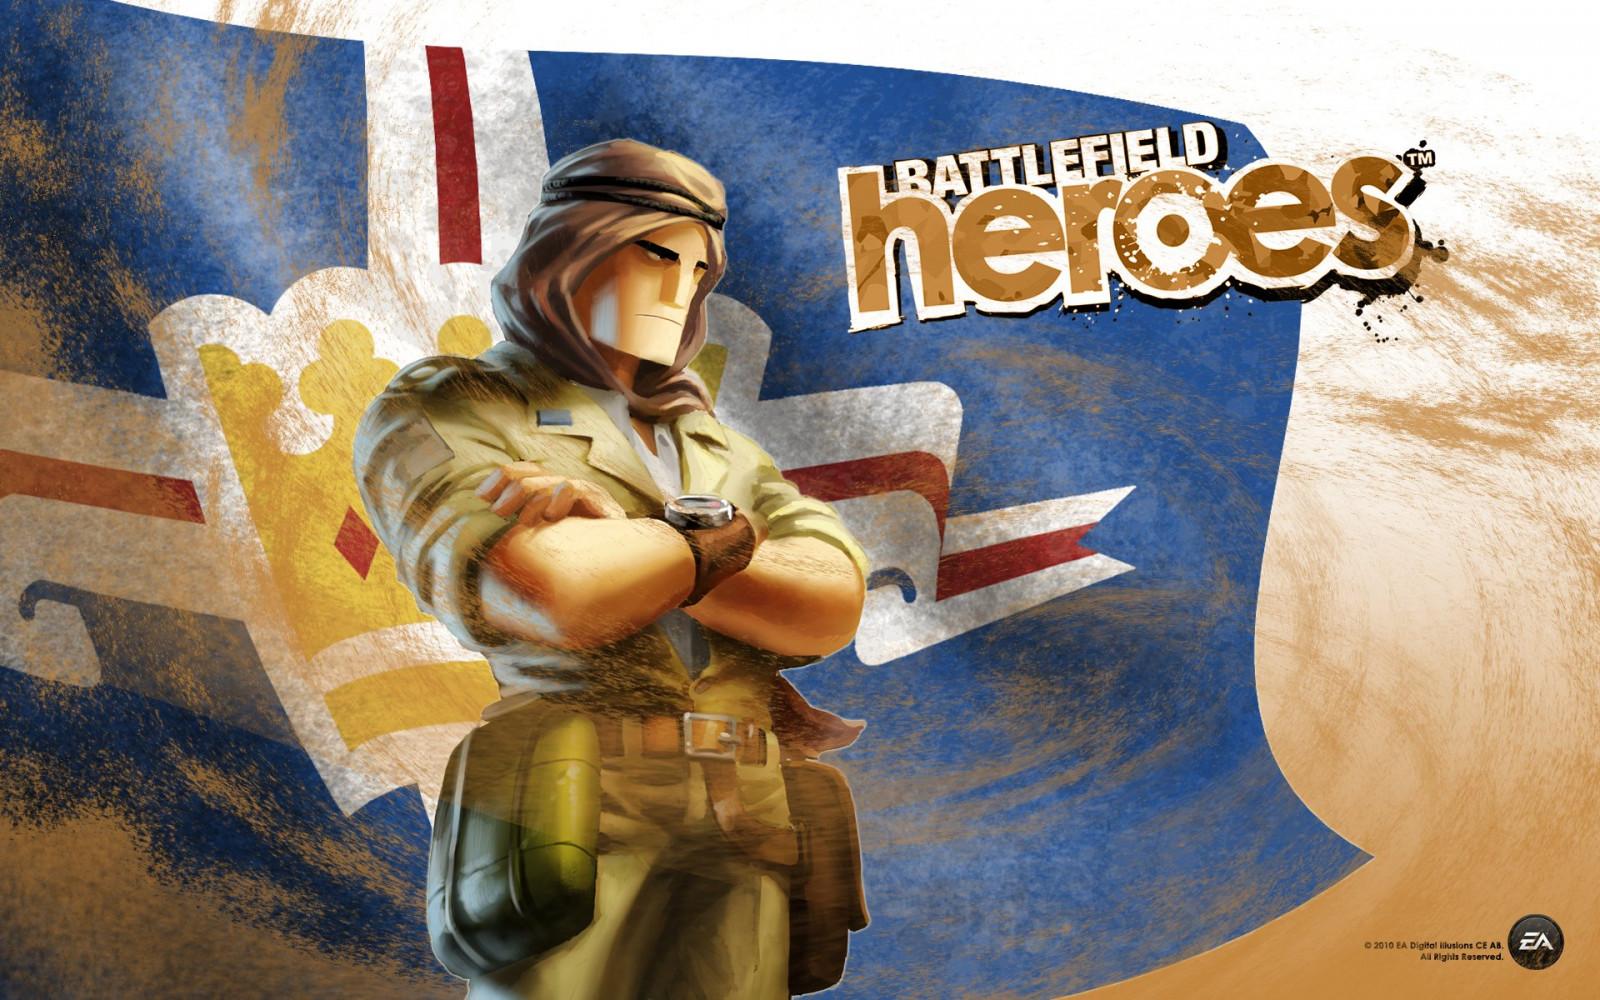 Wallpaper 1920x1200 Px 1bheroes Action Battlefield Fi